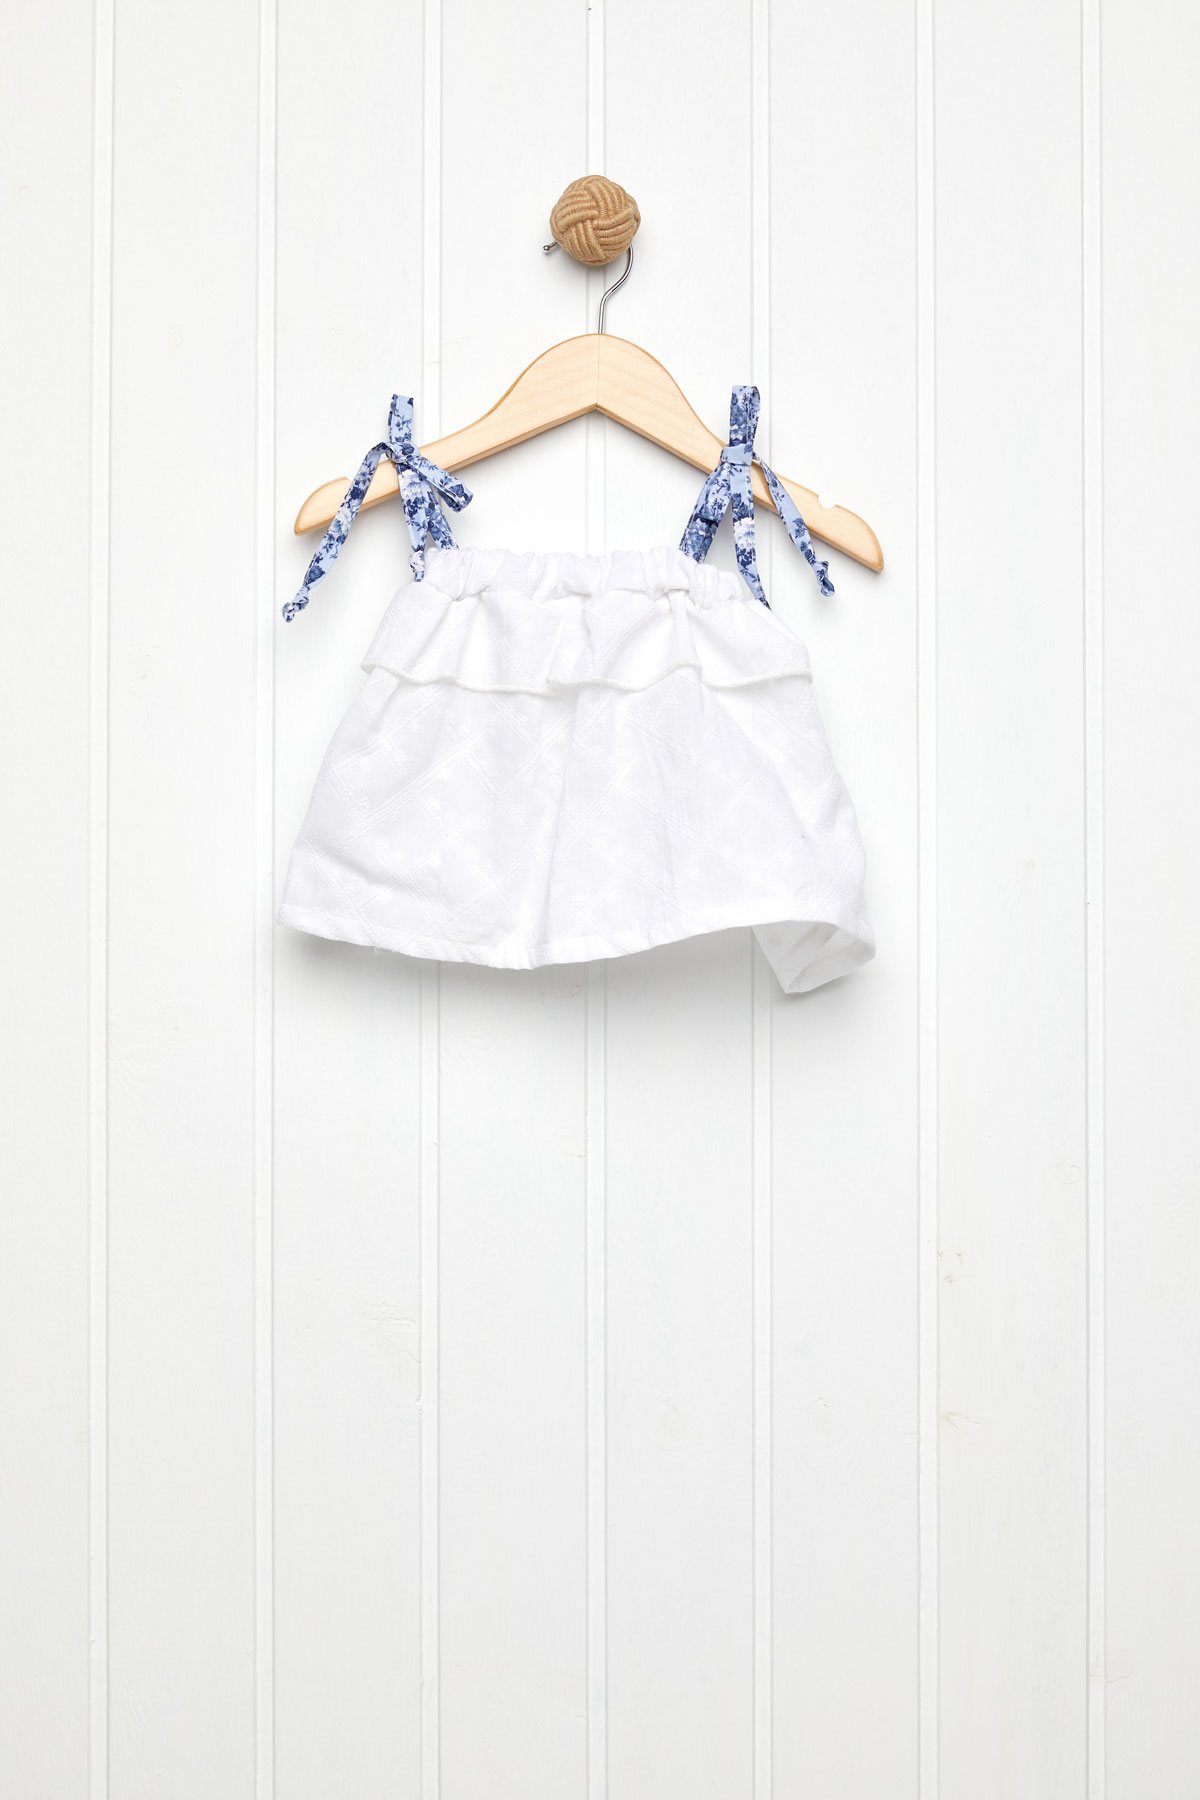 Floral μπλε με λευκό τοπ broderie set/2